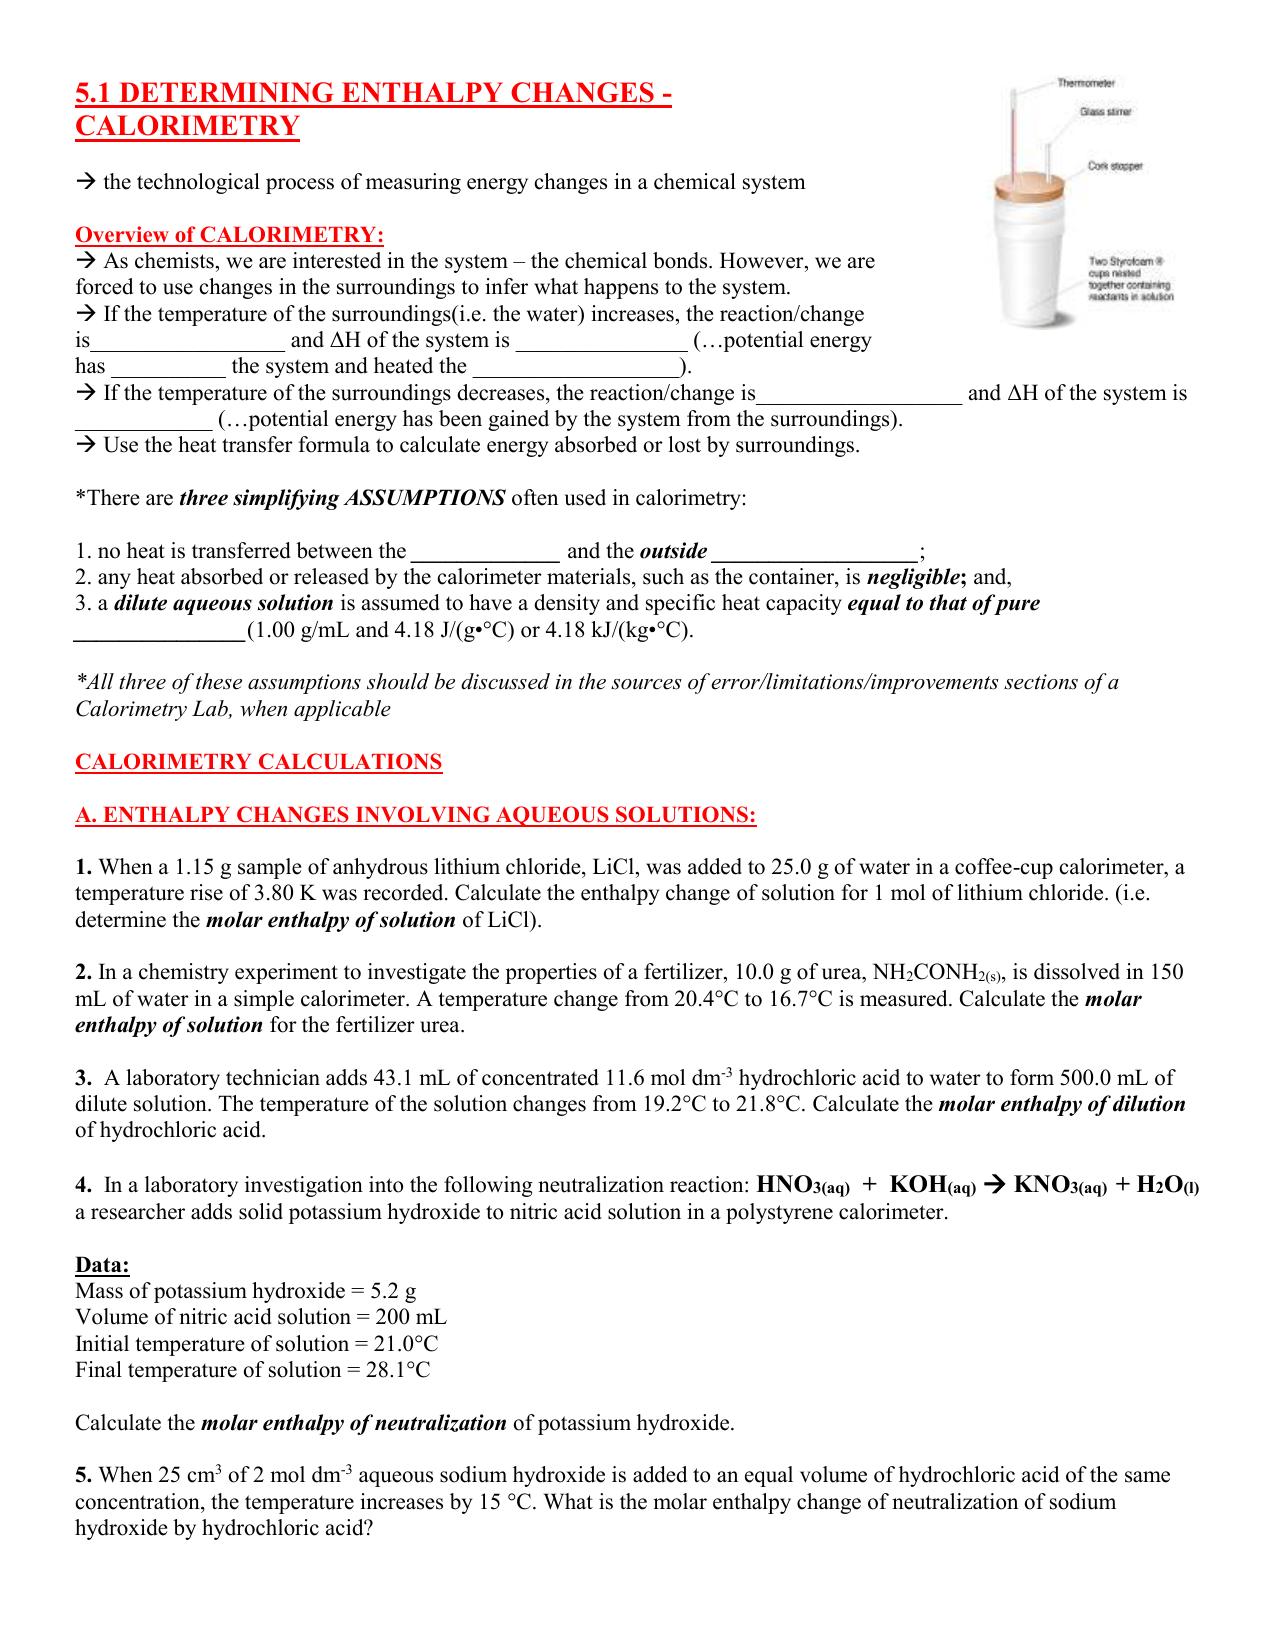 Coffee cup calorimeter problems - Coffee Cup Calorimeter Problems 33